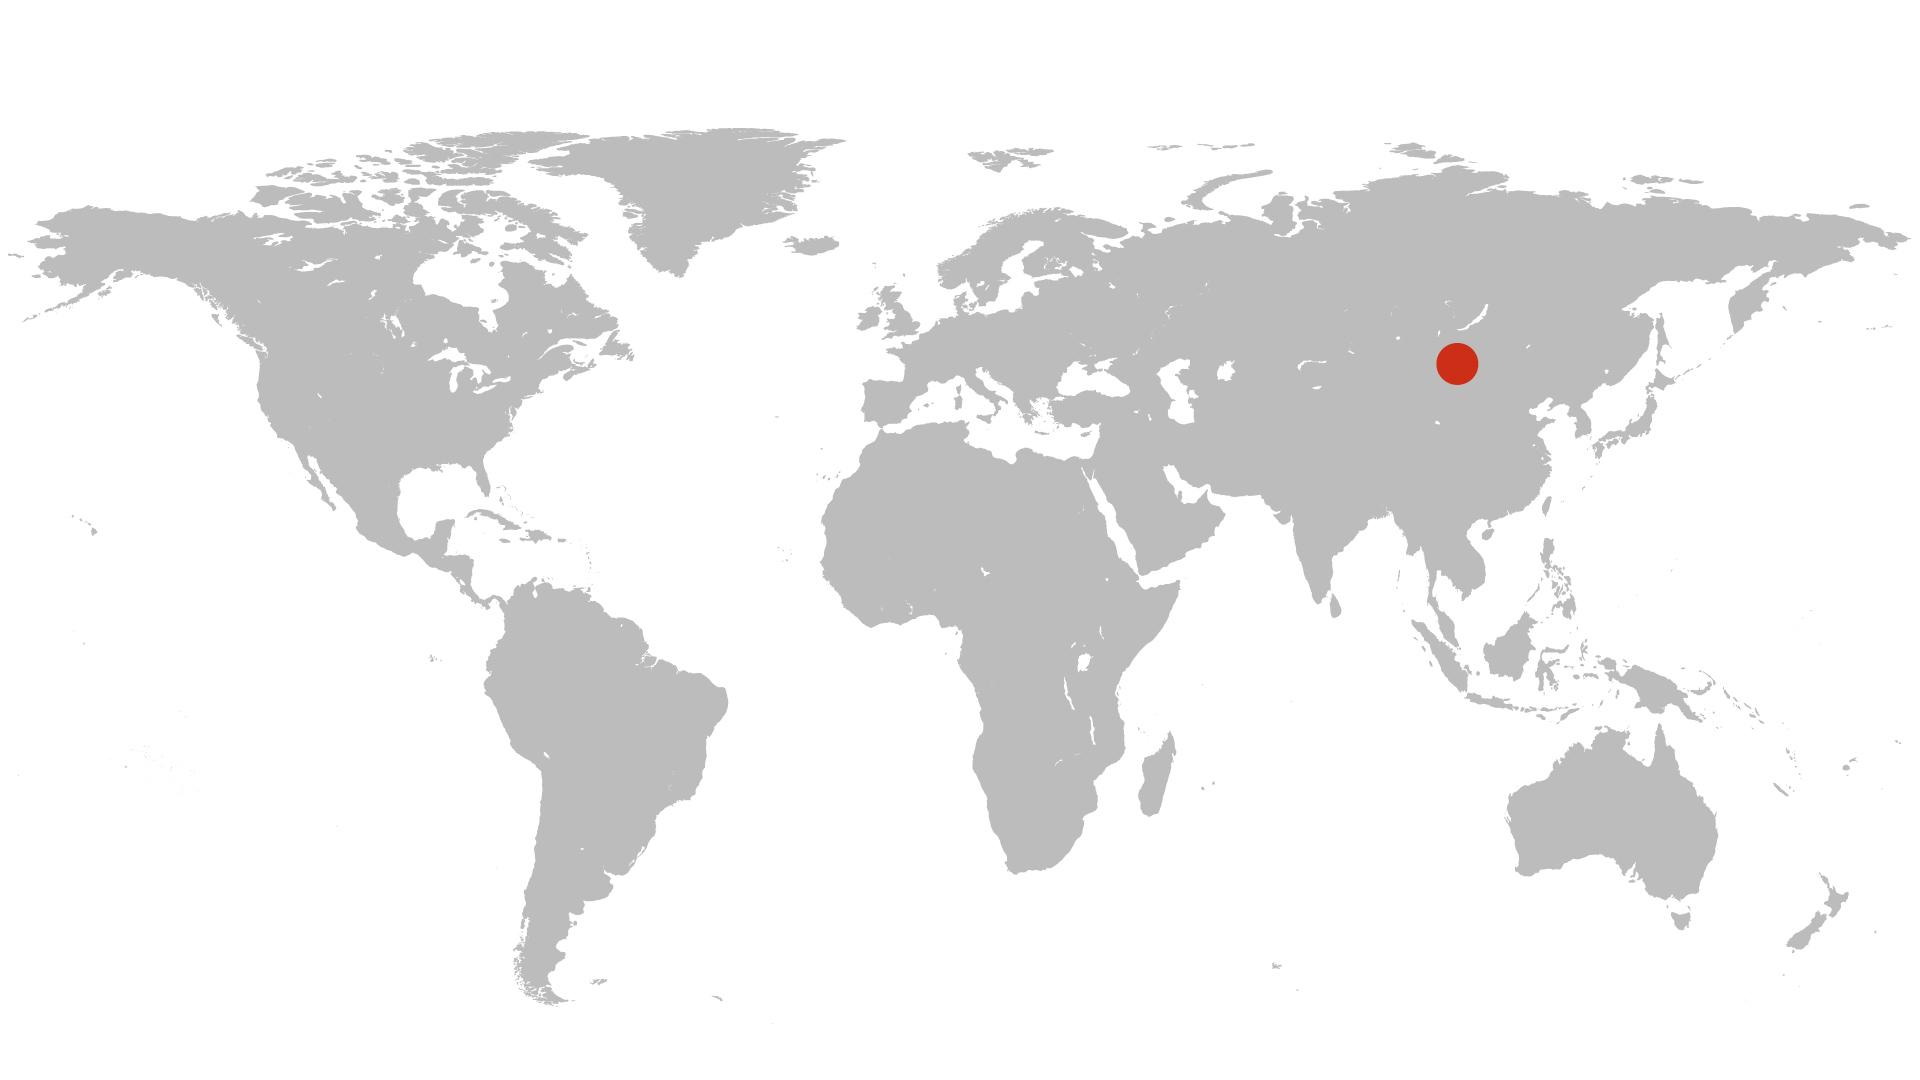 JB_WEB_World_Map__Eagle_Hunters_D01.jpg